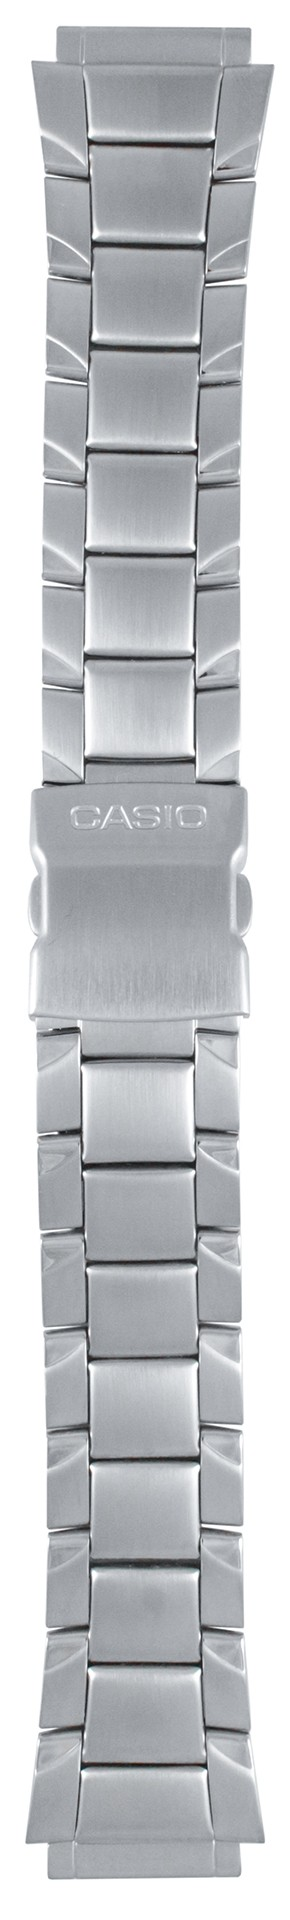 браслет Casio 10134117 AW-S90D-4AV